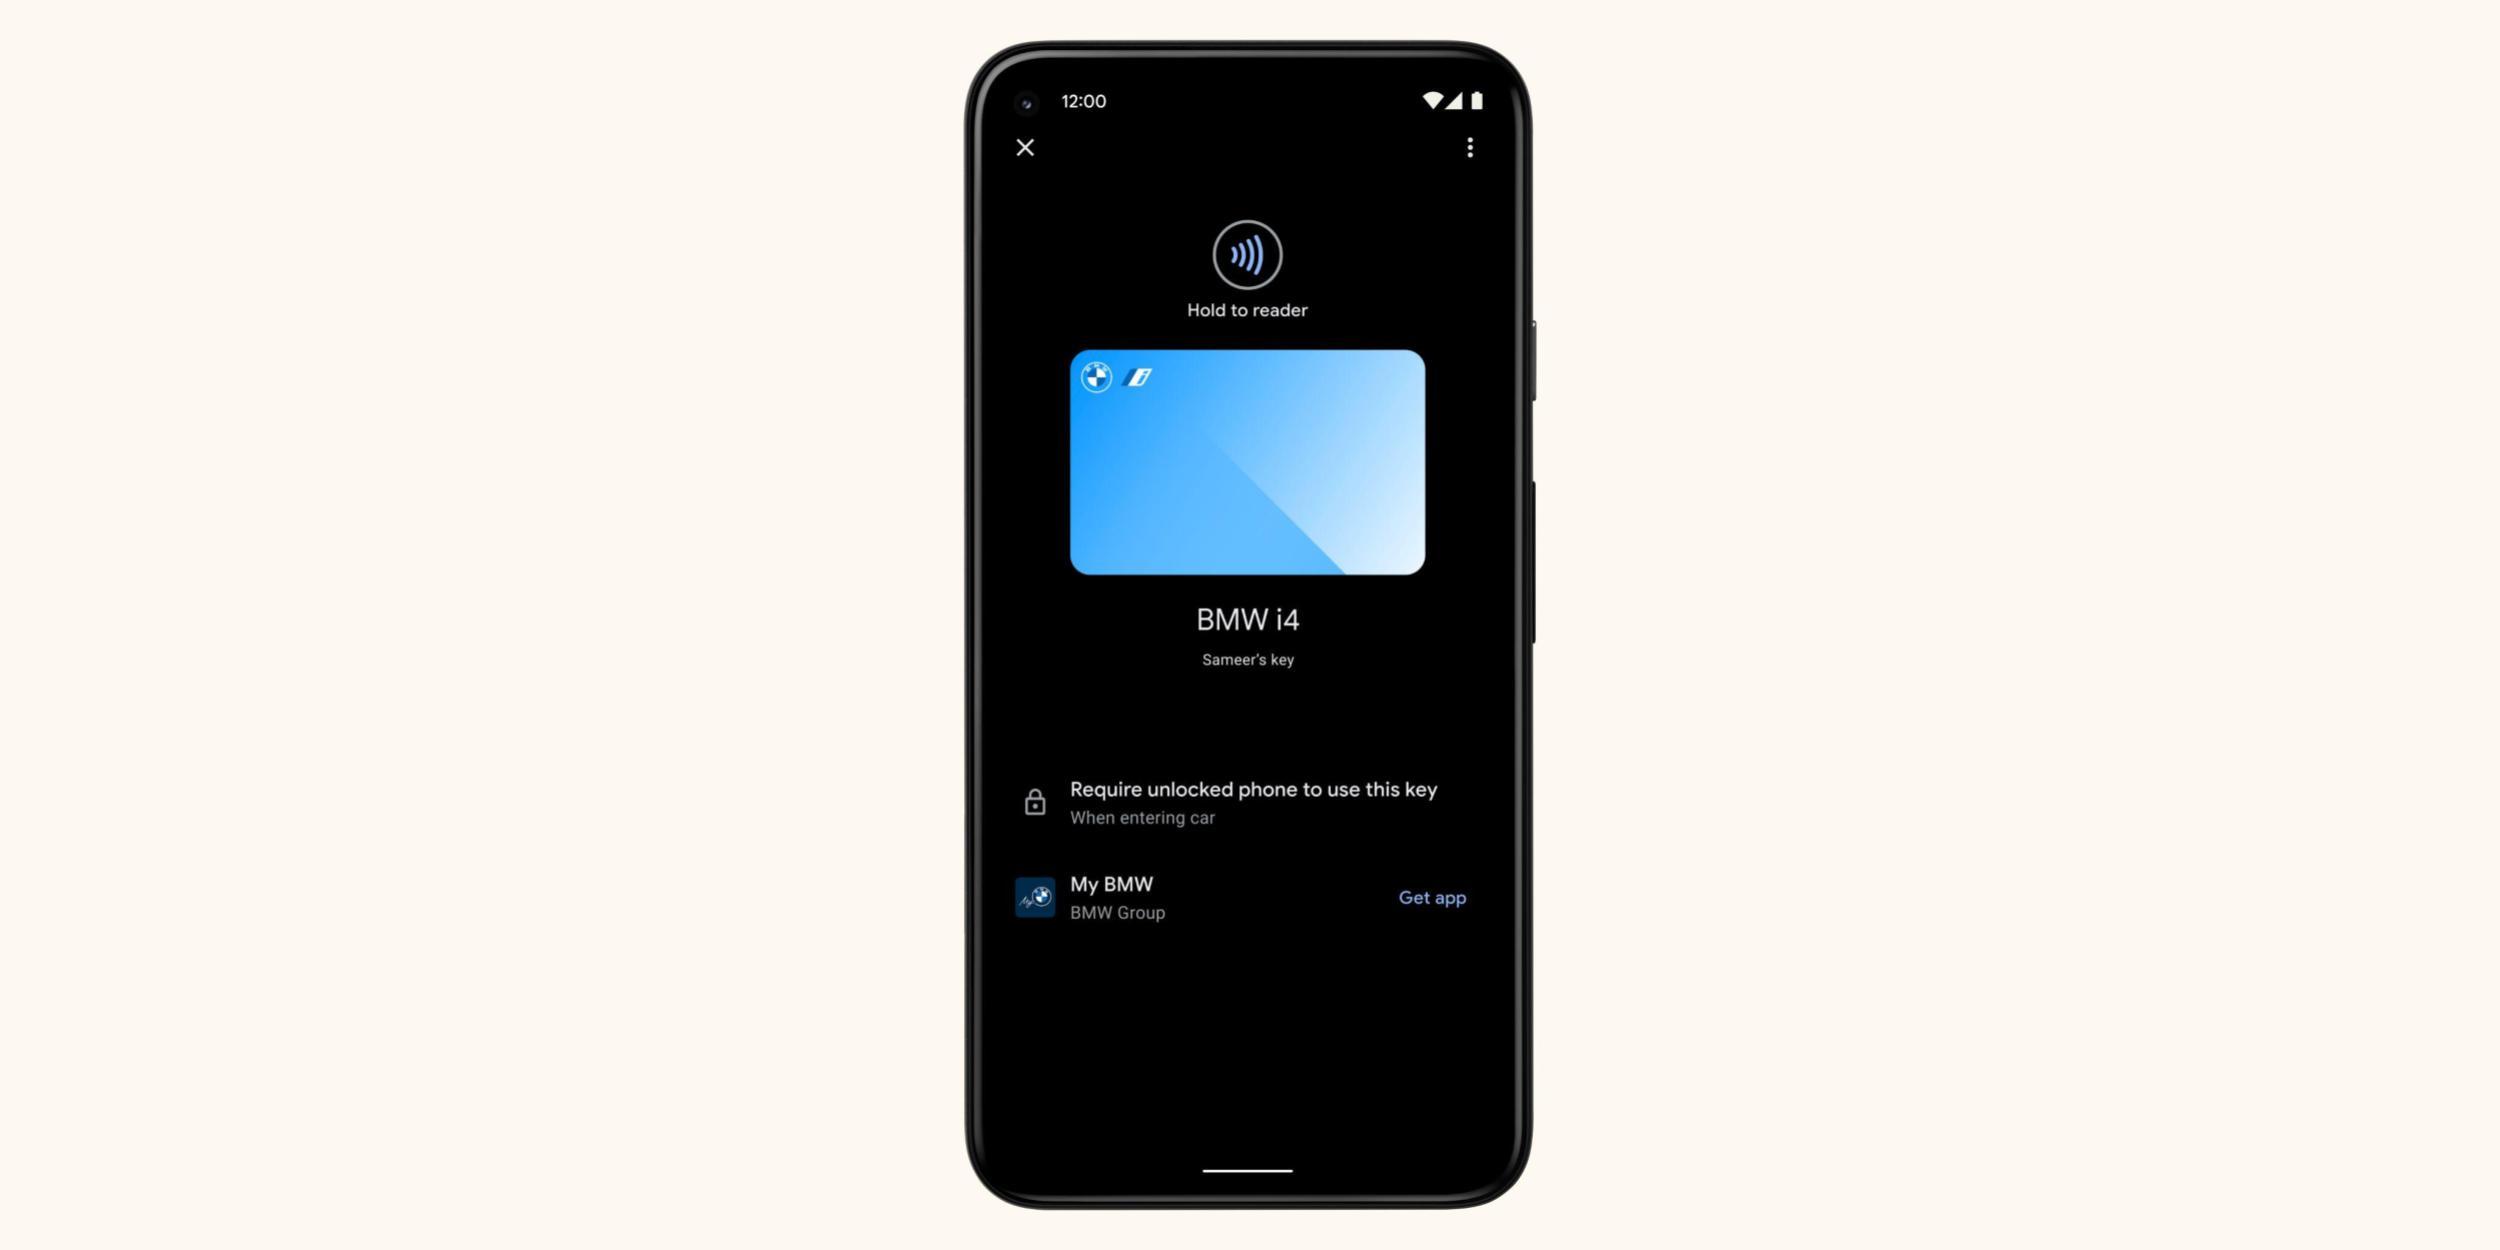 Android 12. Ψηφιακό κλειδί αυτοκινήτου